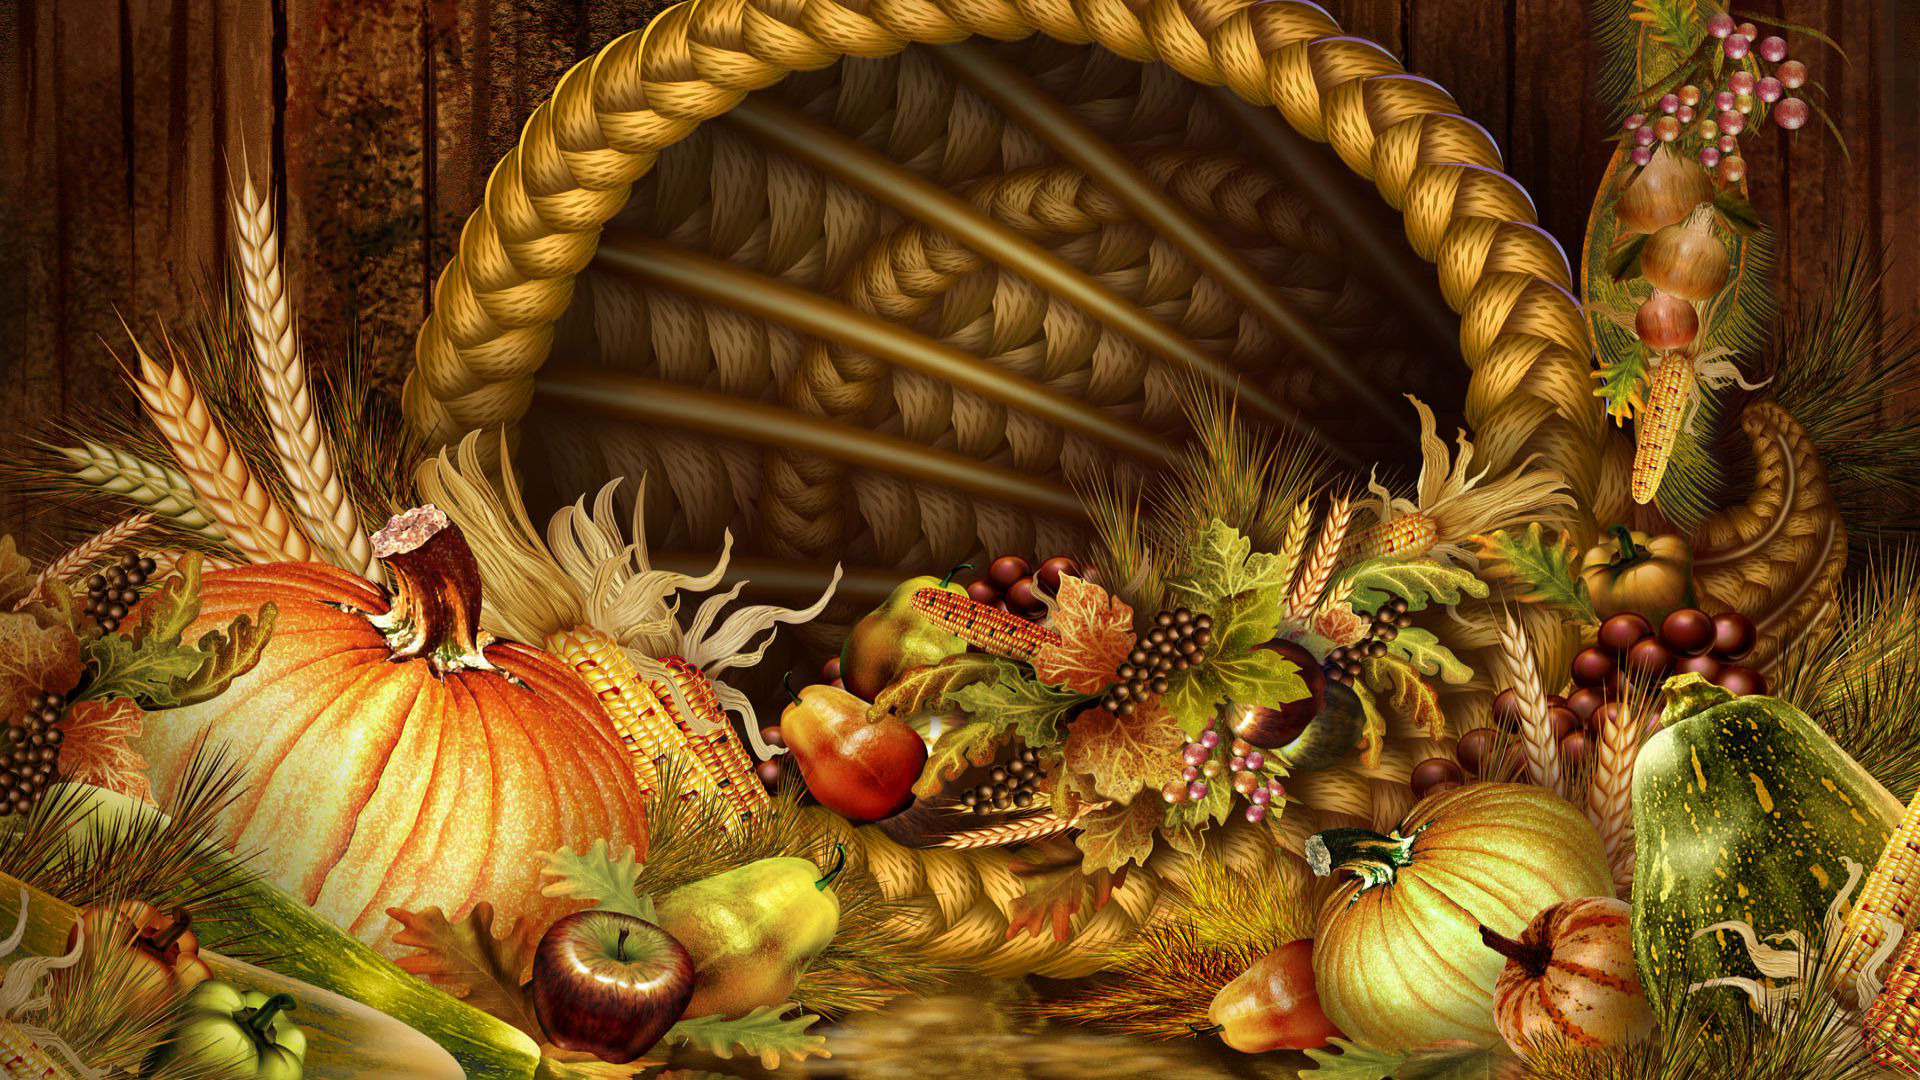 Thanksgiving wallpapers for desktop 1600x900 wallpapersafari - Thanksgiving wallpaper backgrounds ...